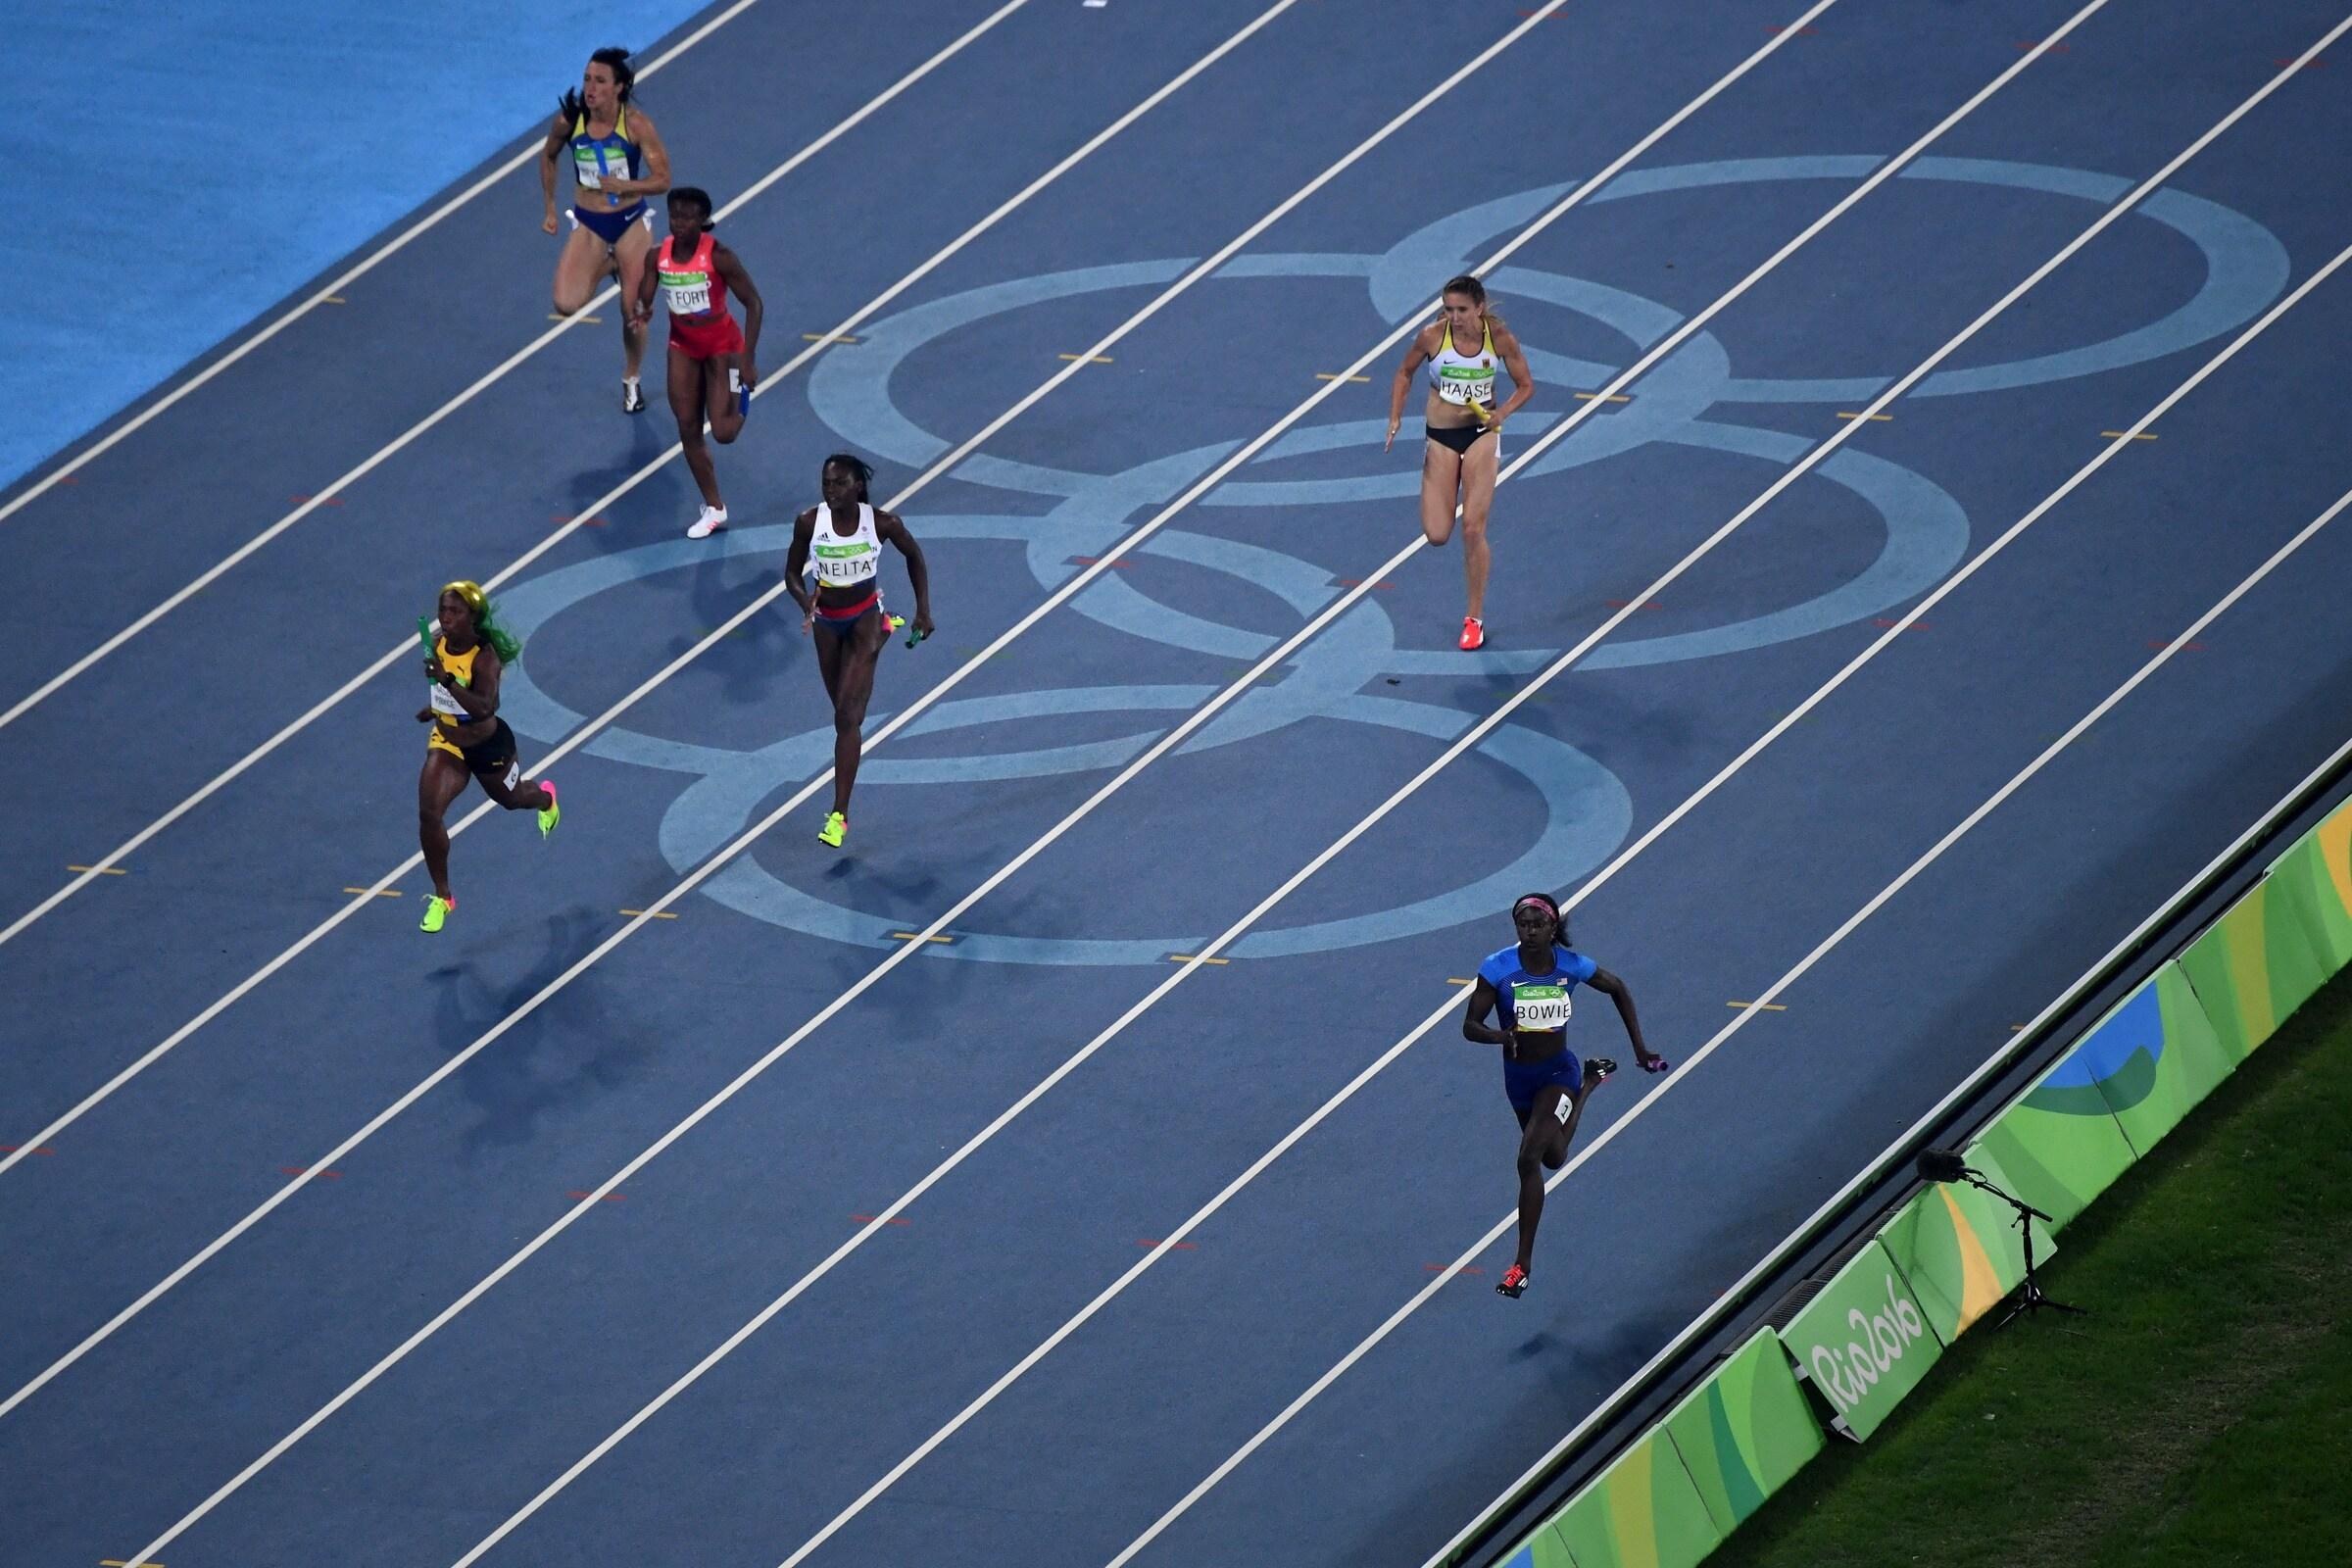 Athletics - 4x100m Relay Women